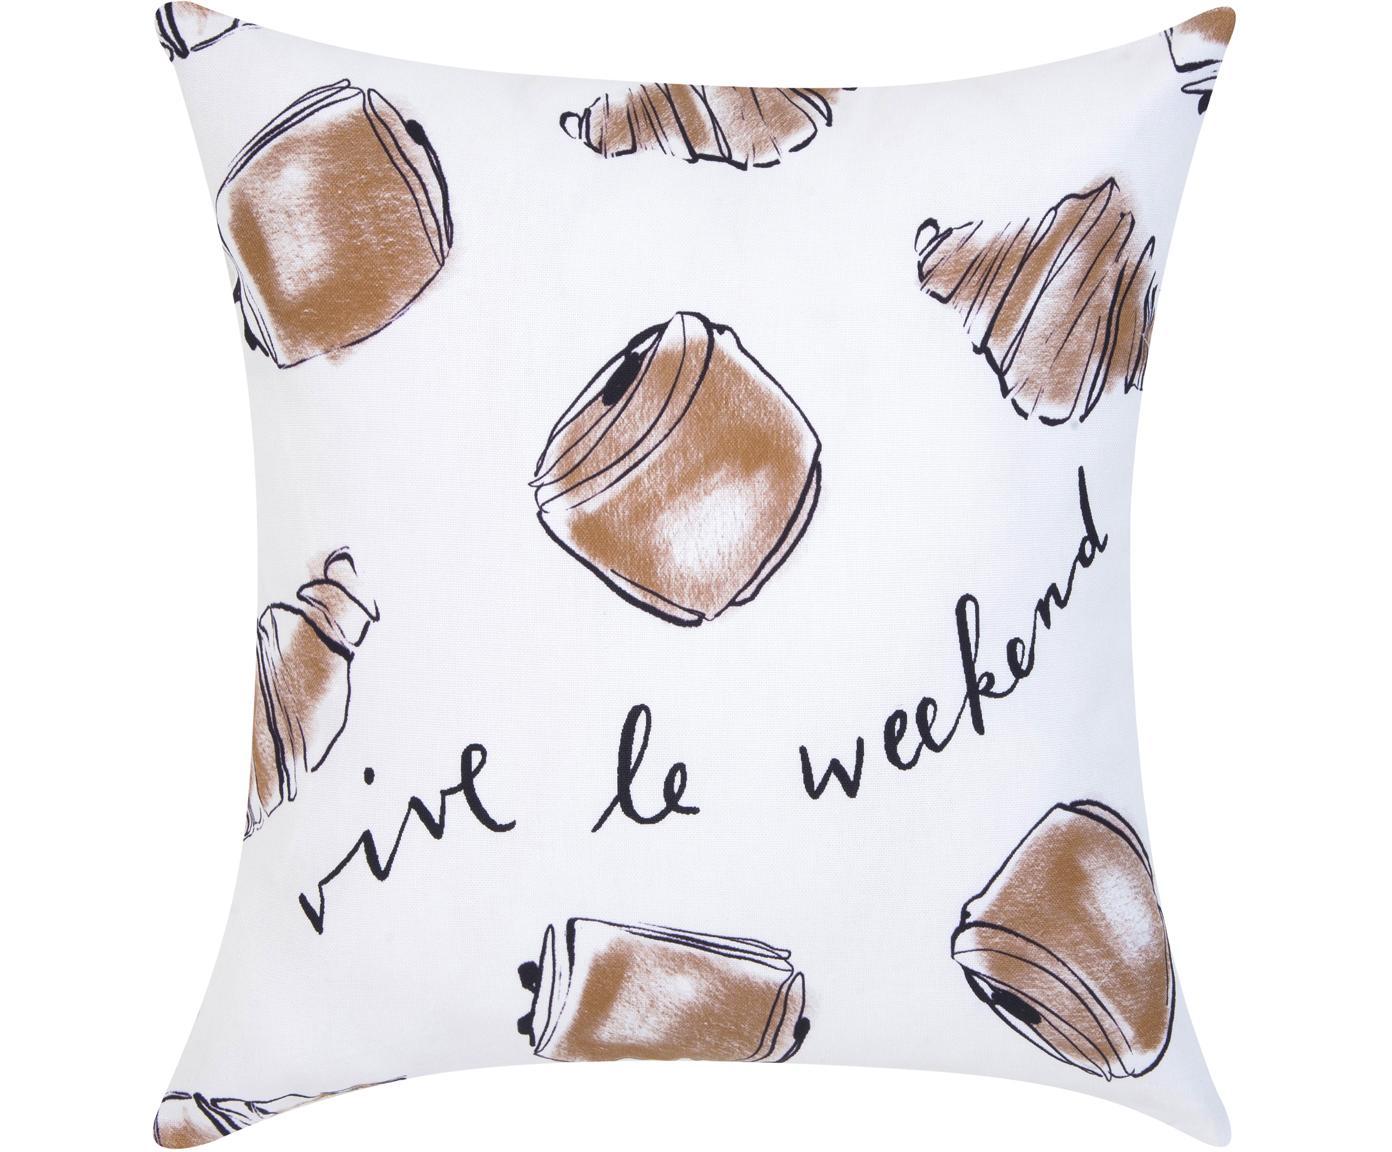 Funda de cojín de diseño Kera Till Croissant, Algodón, Blanco, fresno, Cama 180/200 cm (270 x 280 cm)